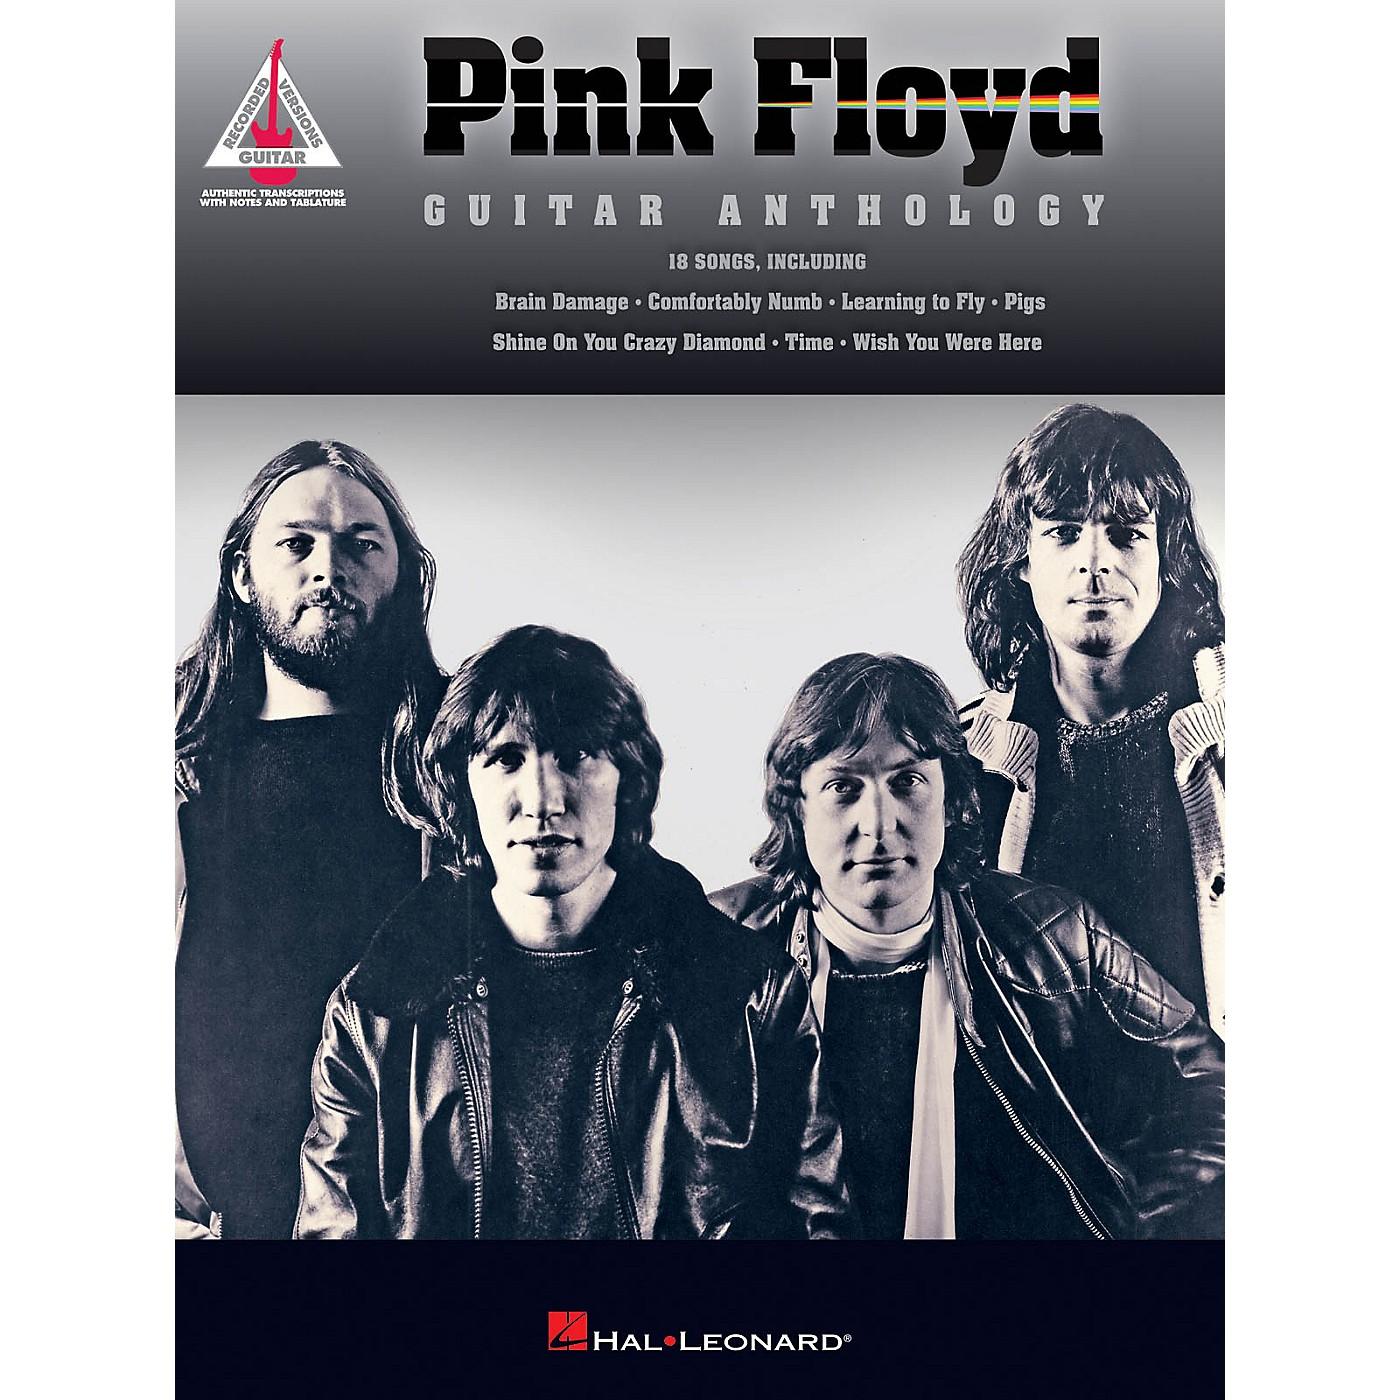 Hal Leonard Pink Floyd - Guitar Anthology Guitar Tab Songbook thumbnail